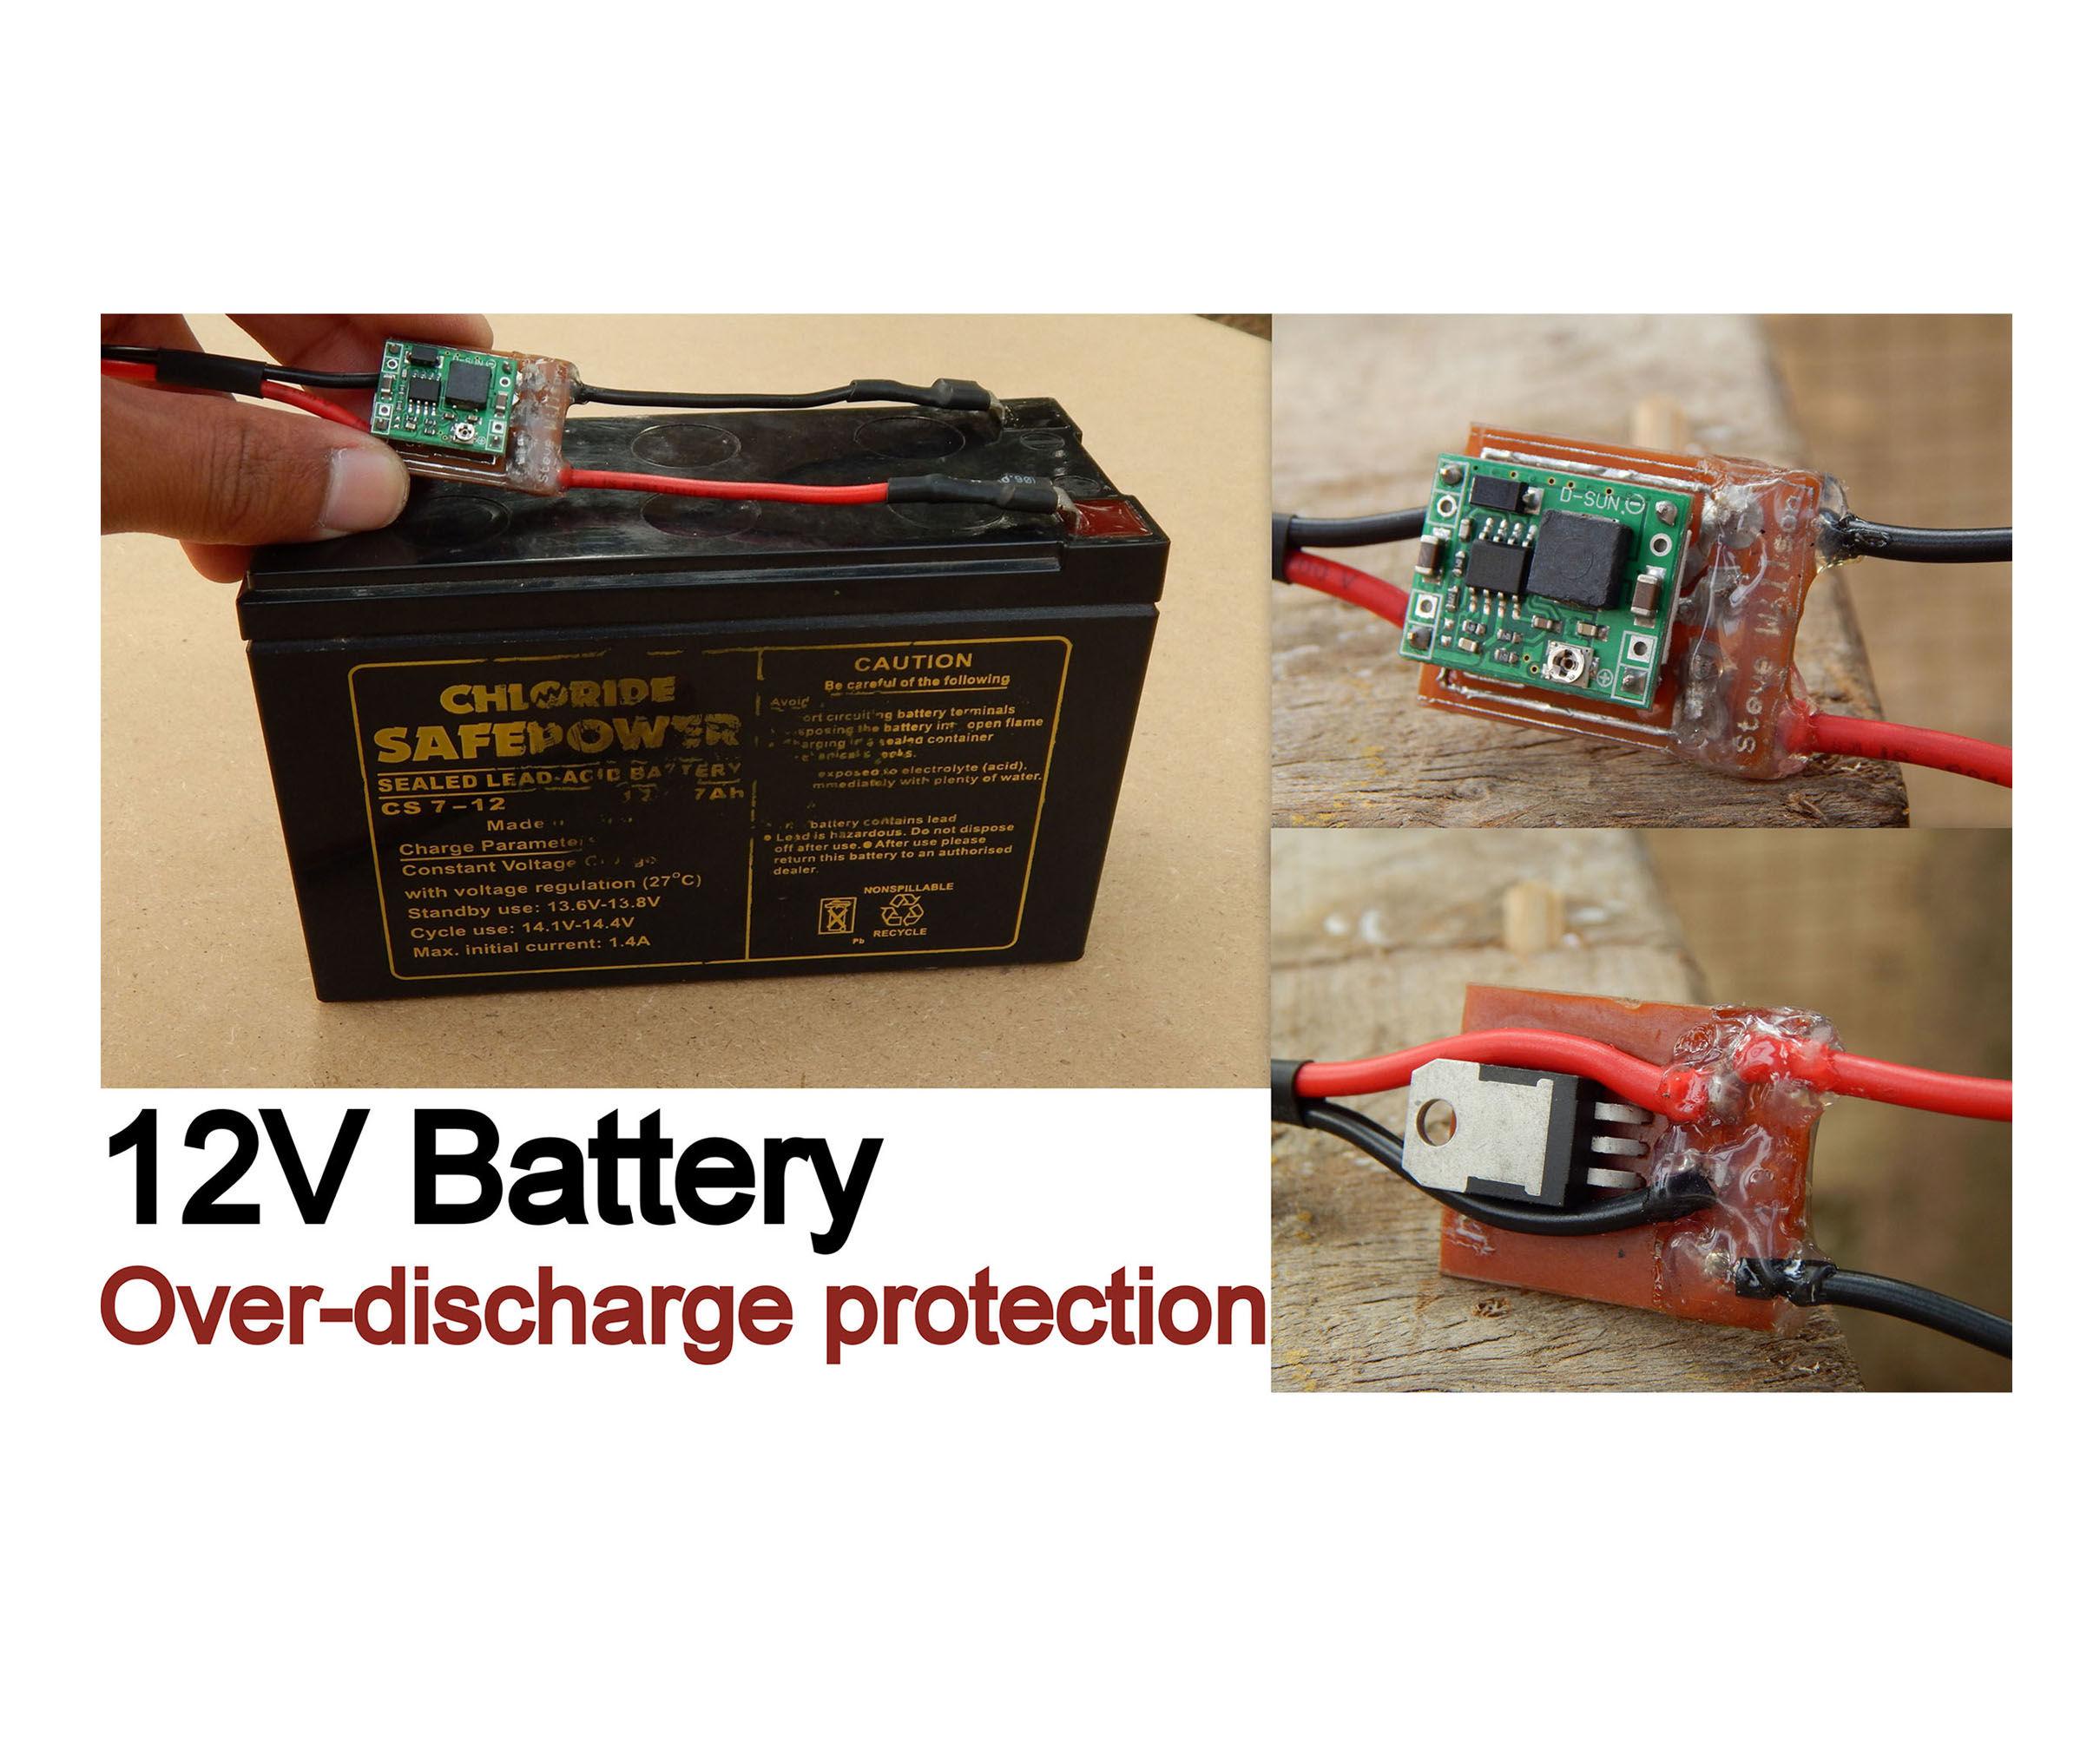 12V Battery Protection